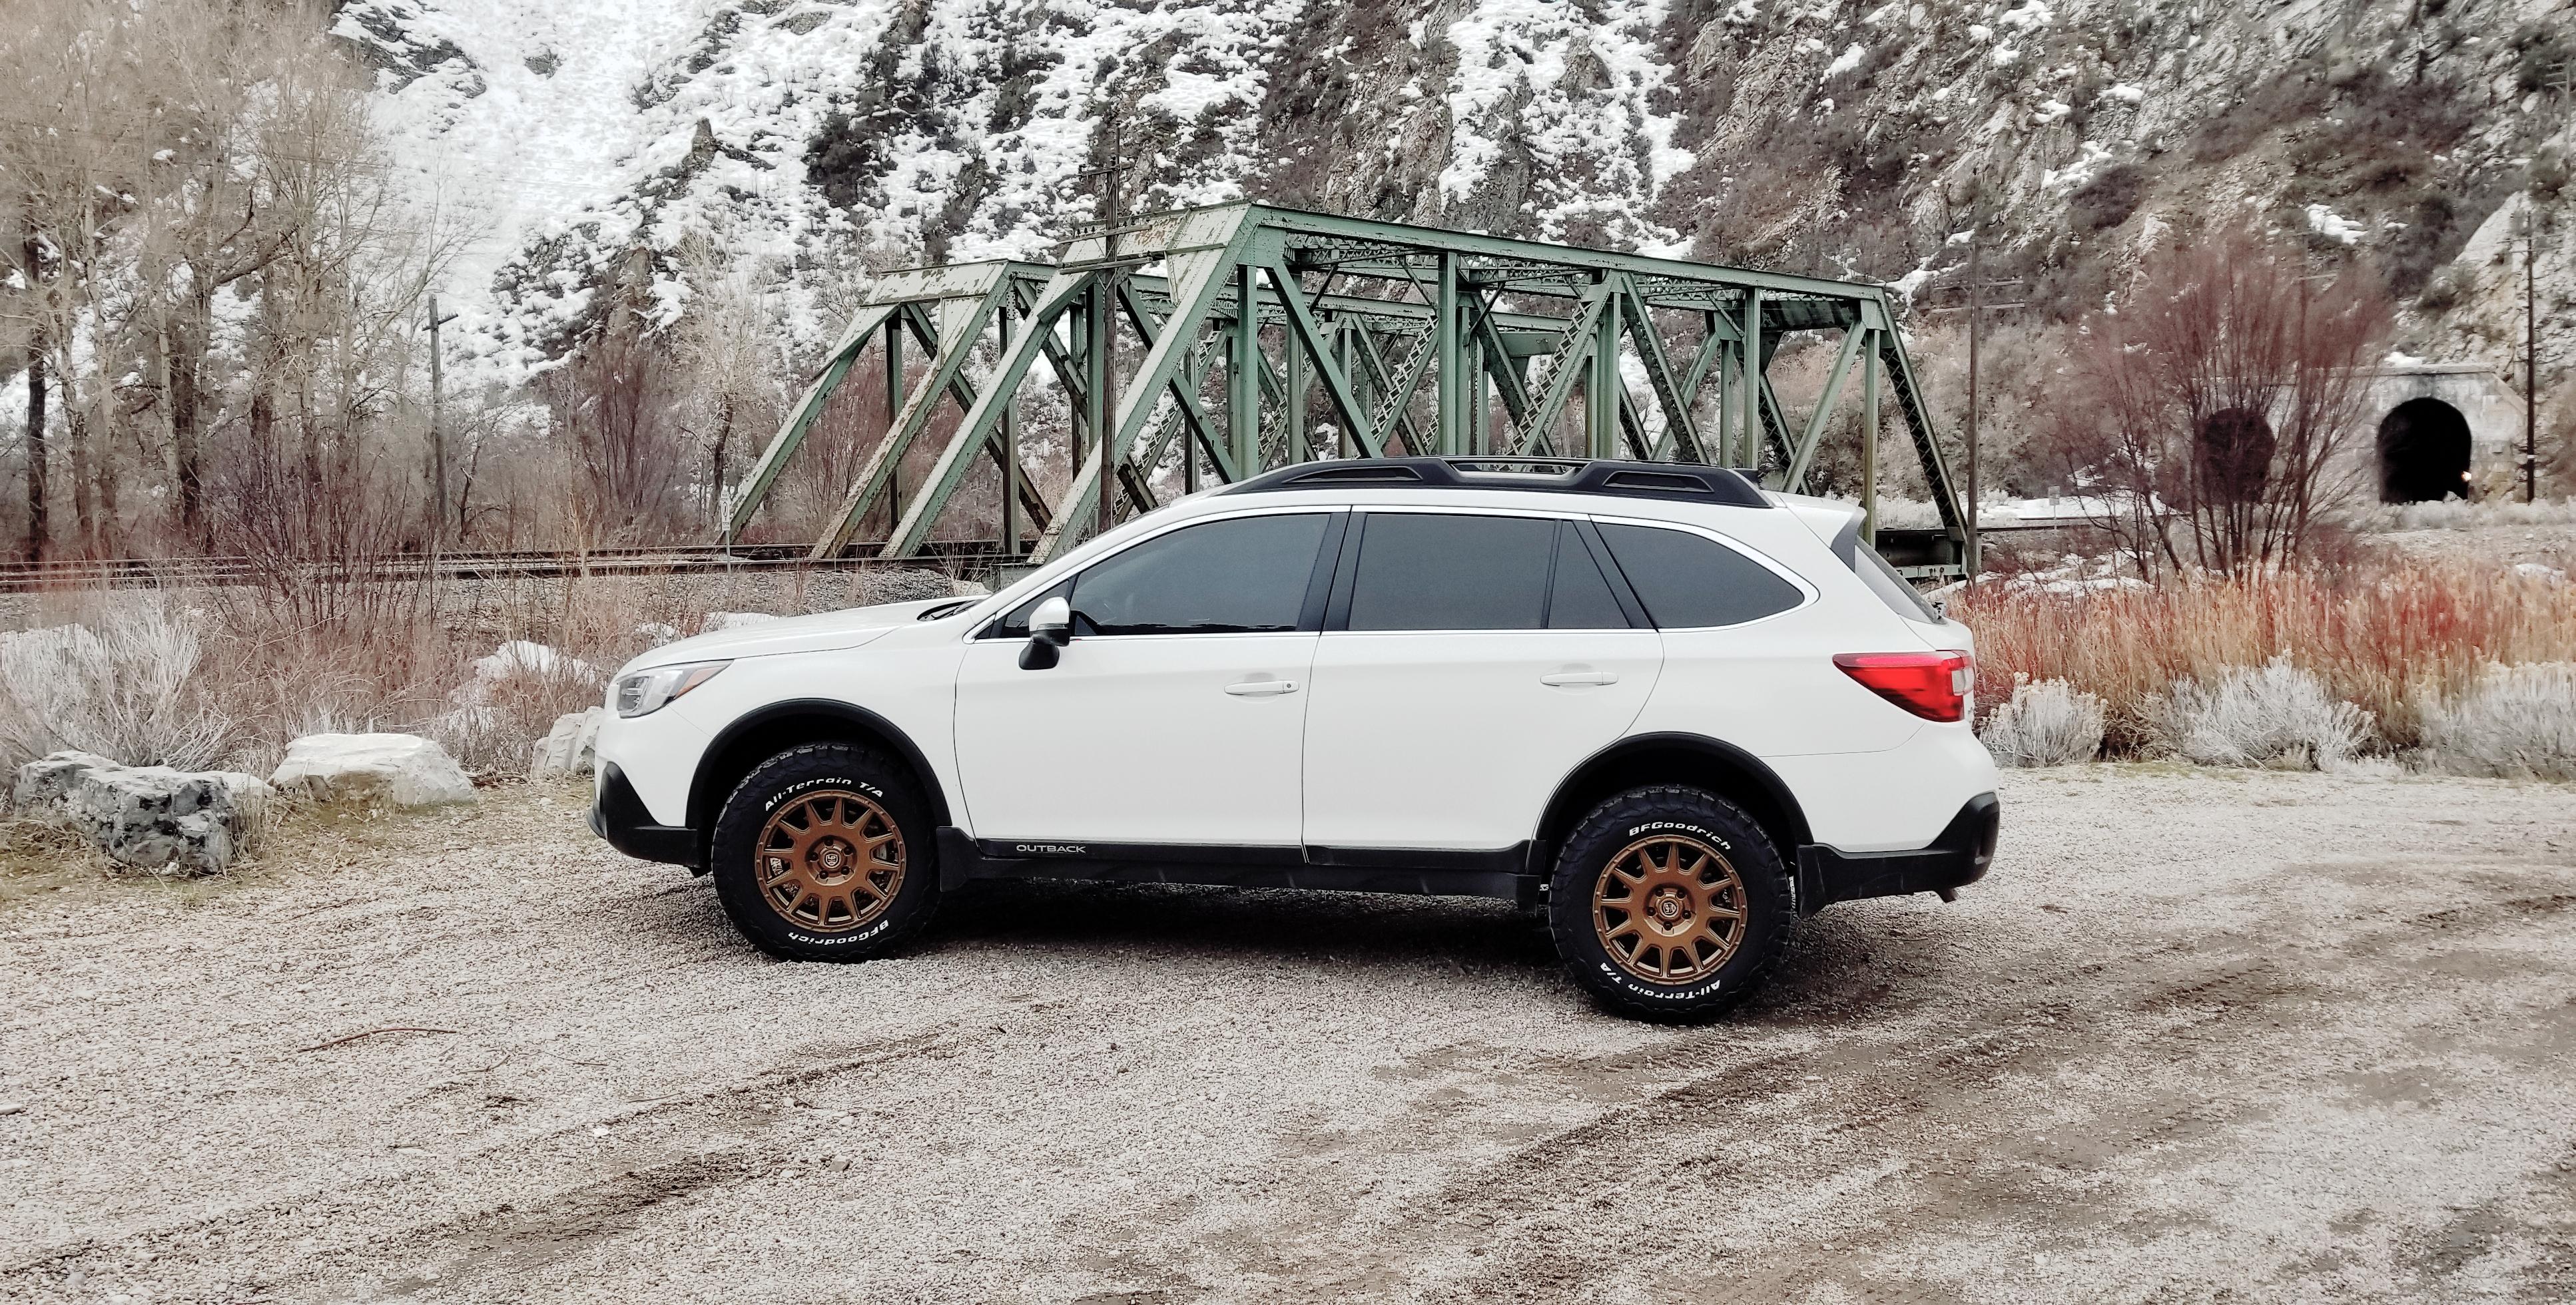 100+ 2015 Subaru Outback Lifted – yasminroohi